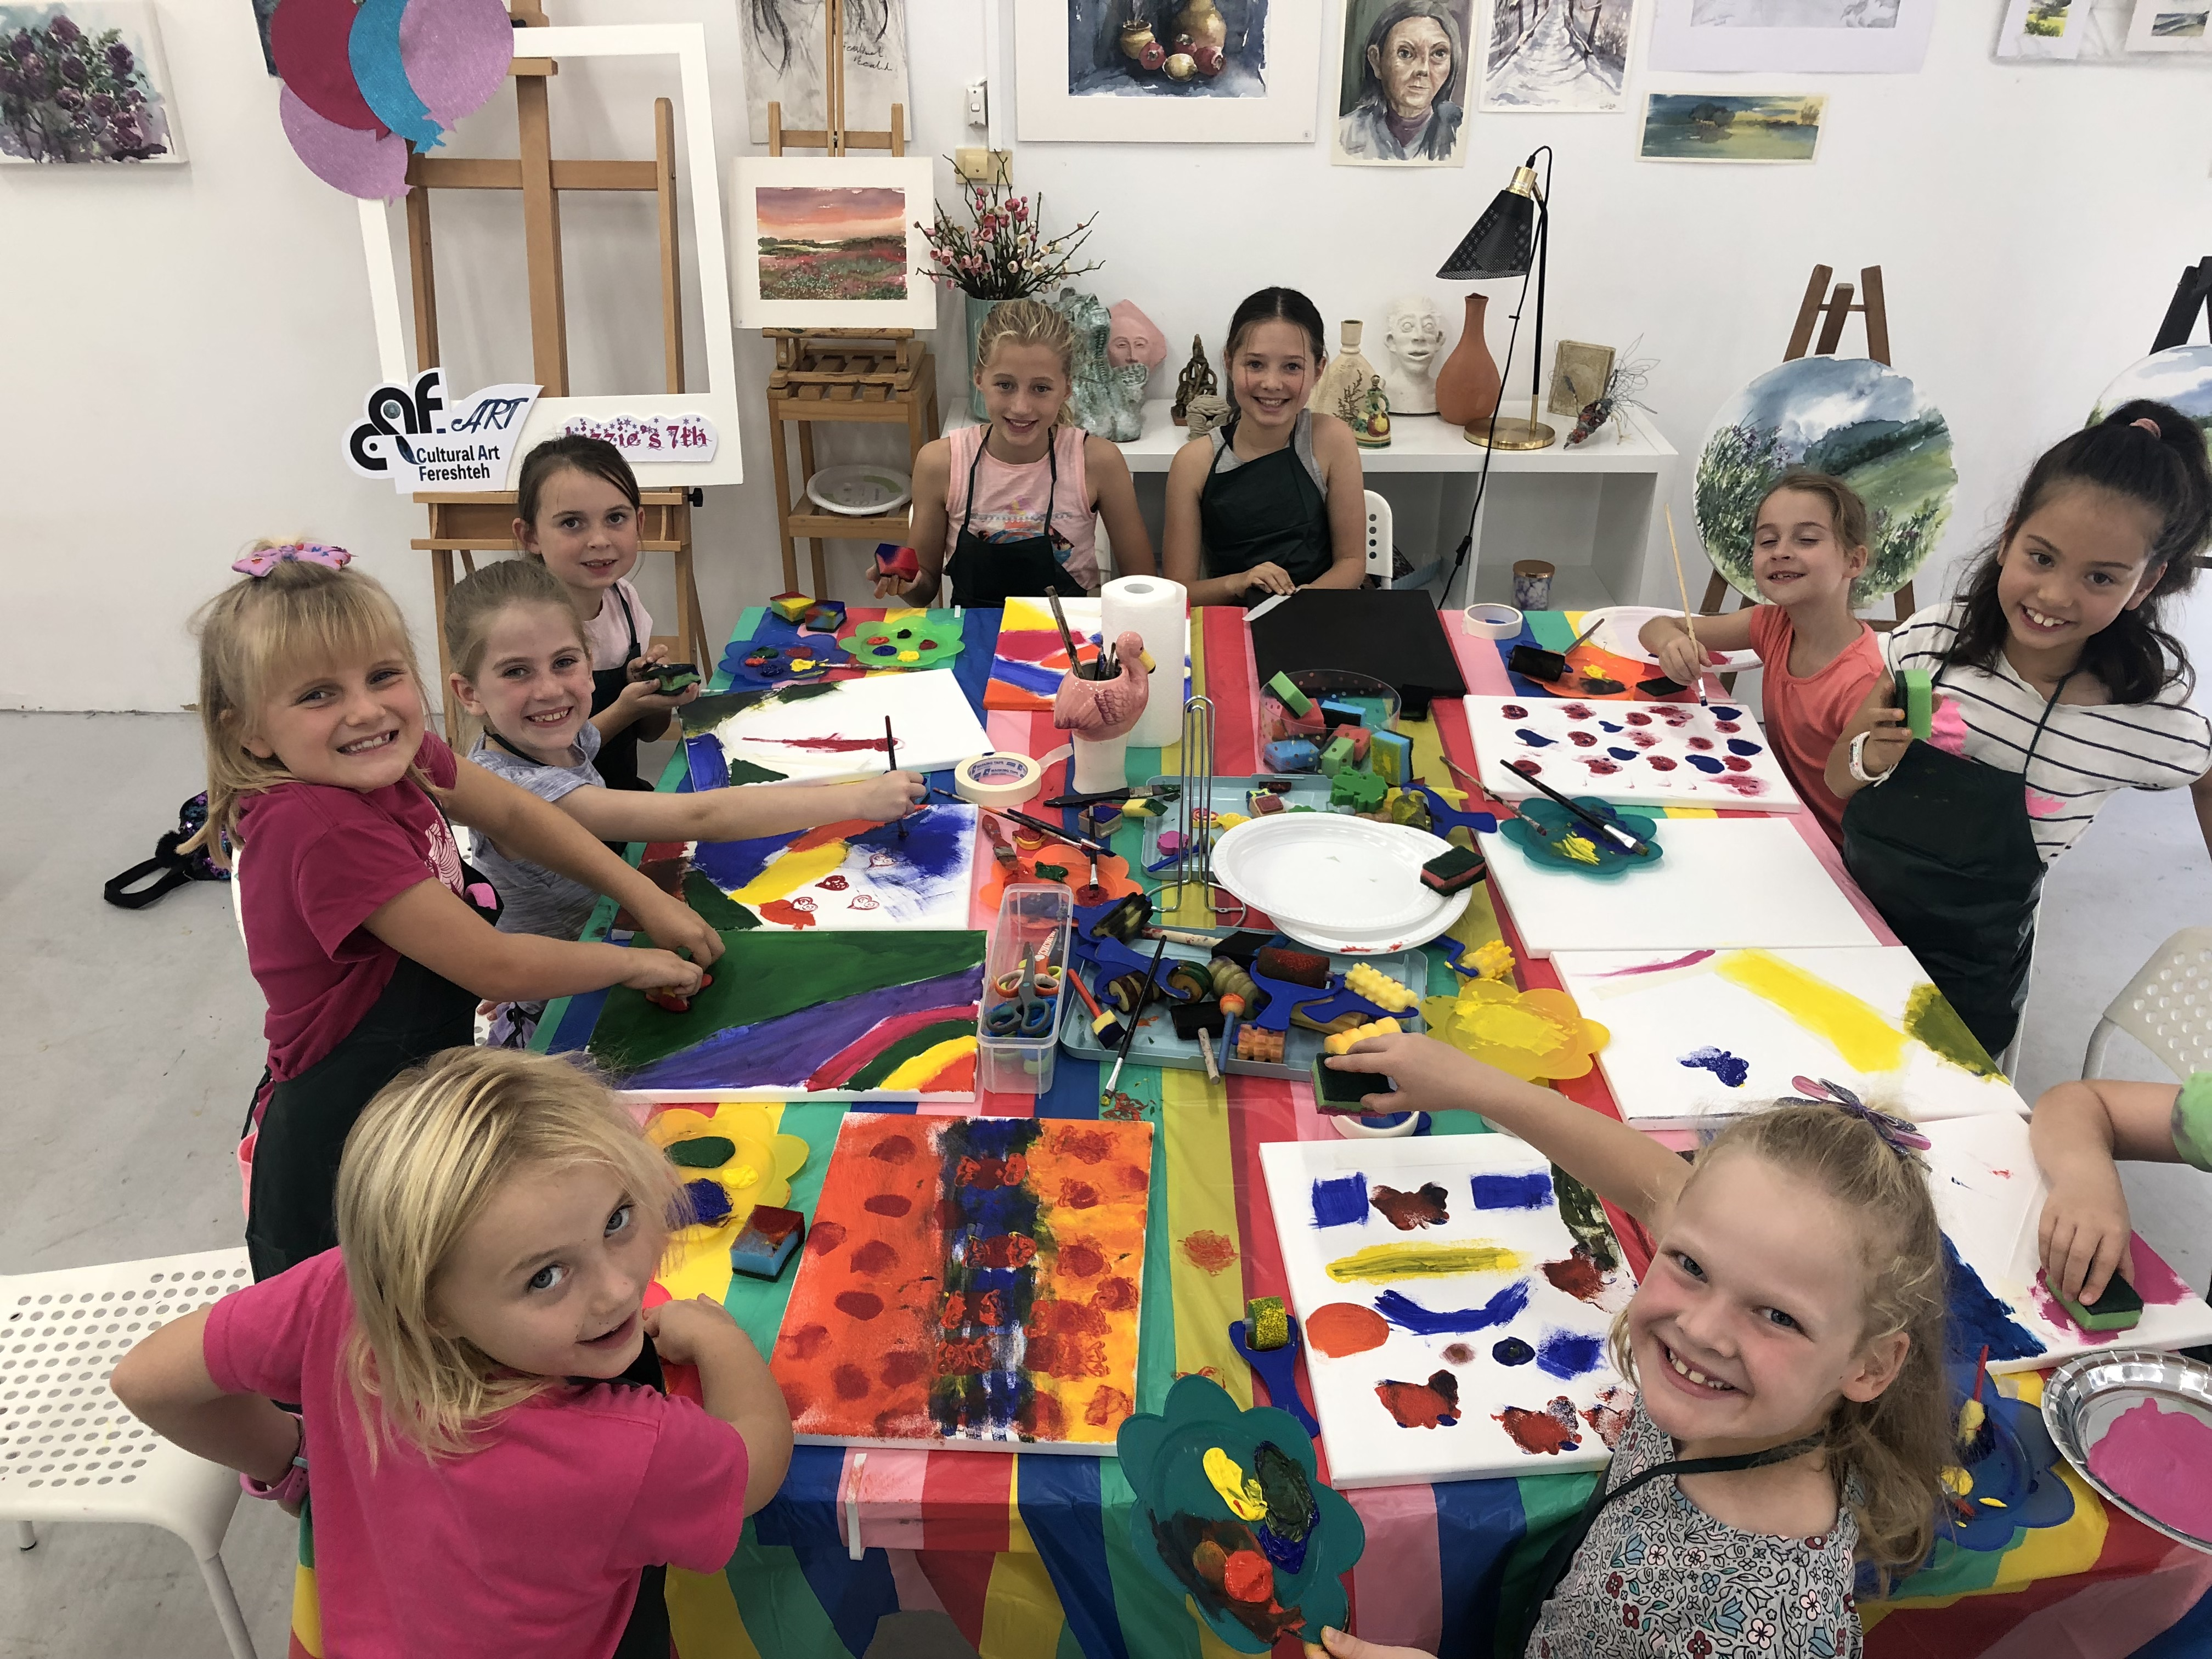 Painting & Sculpture classes for Children